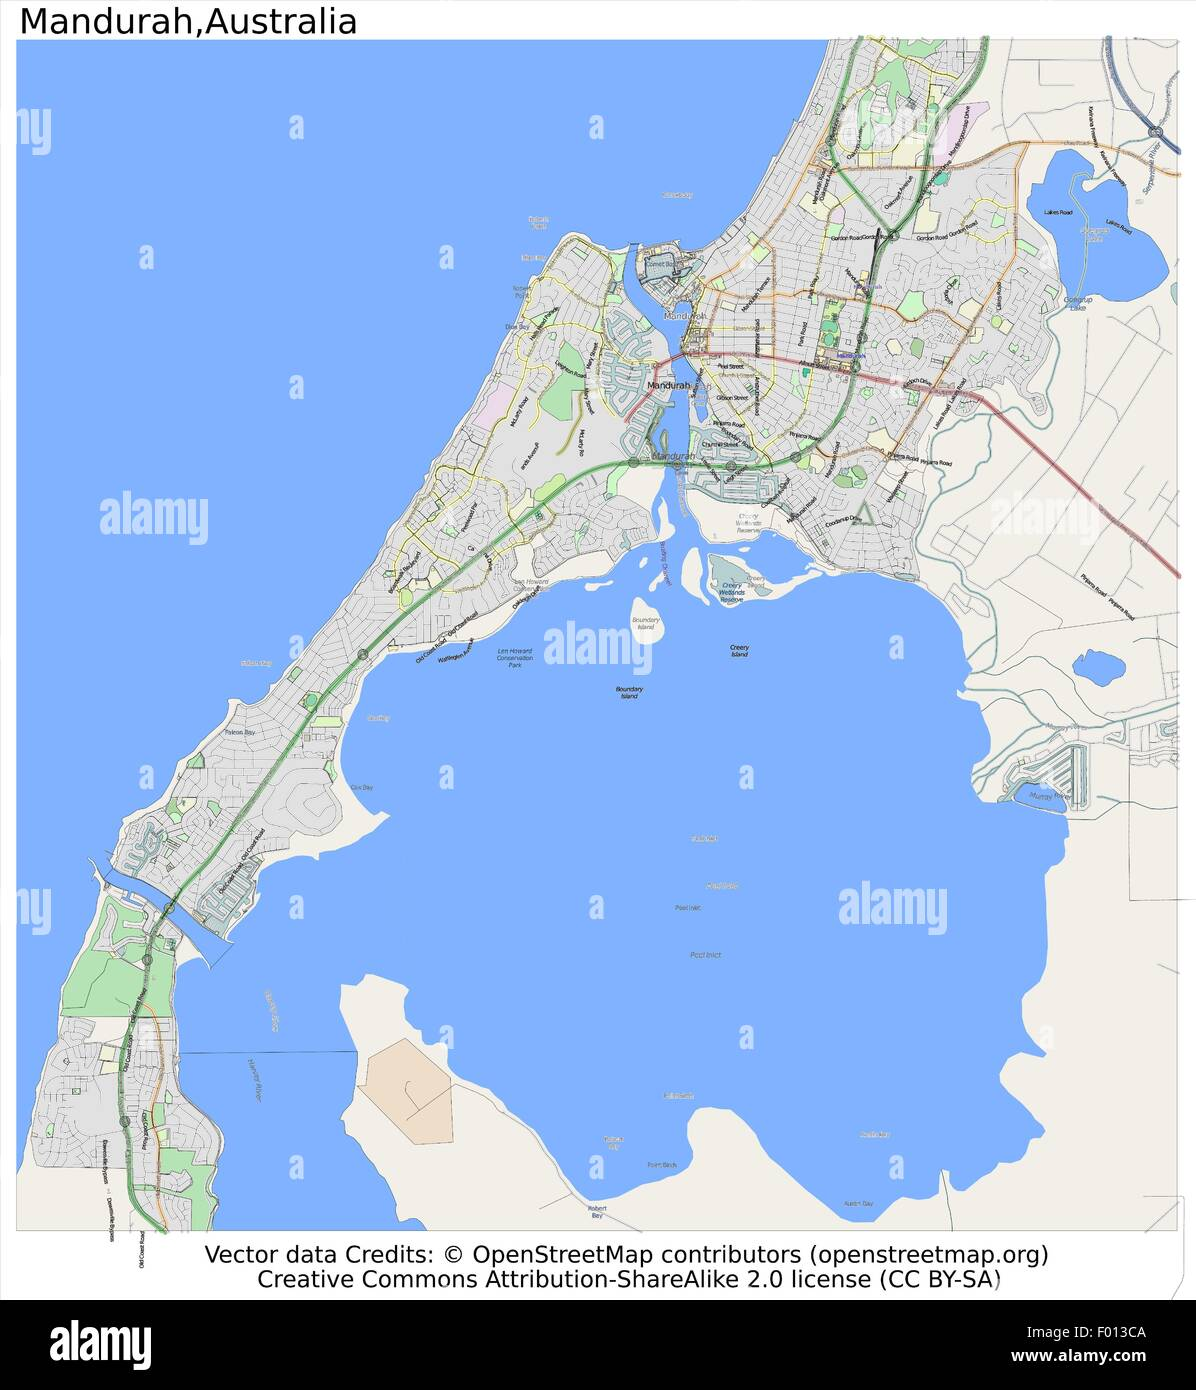 mandurah australia area city map aerial view